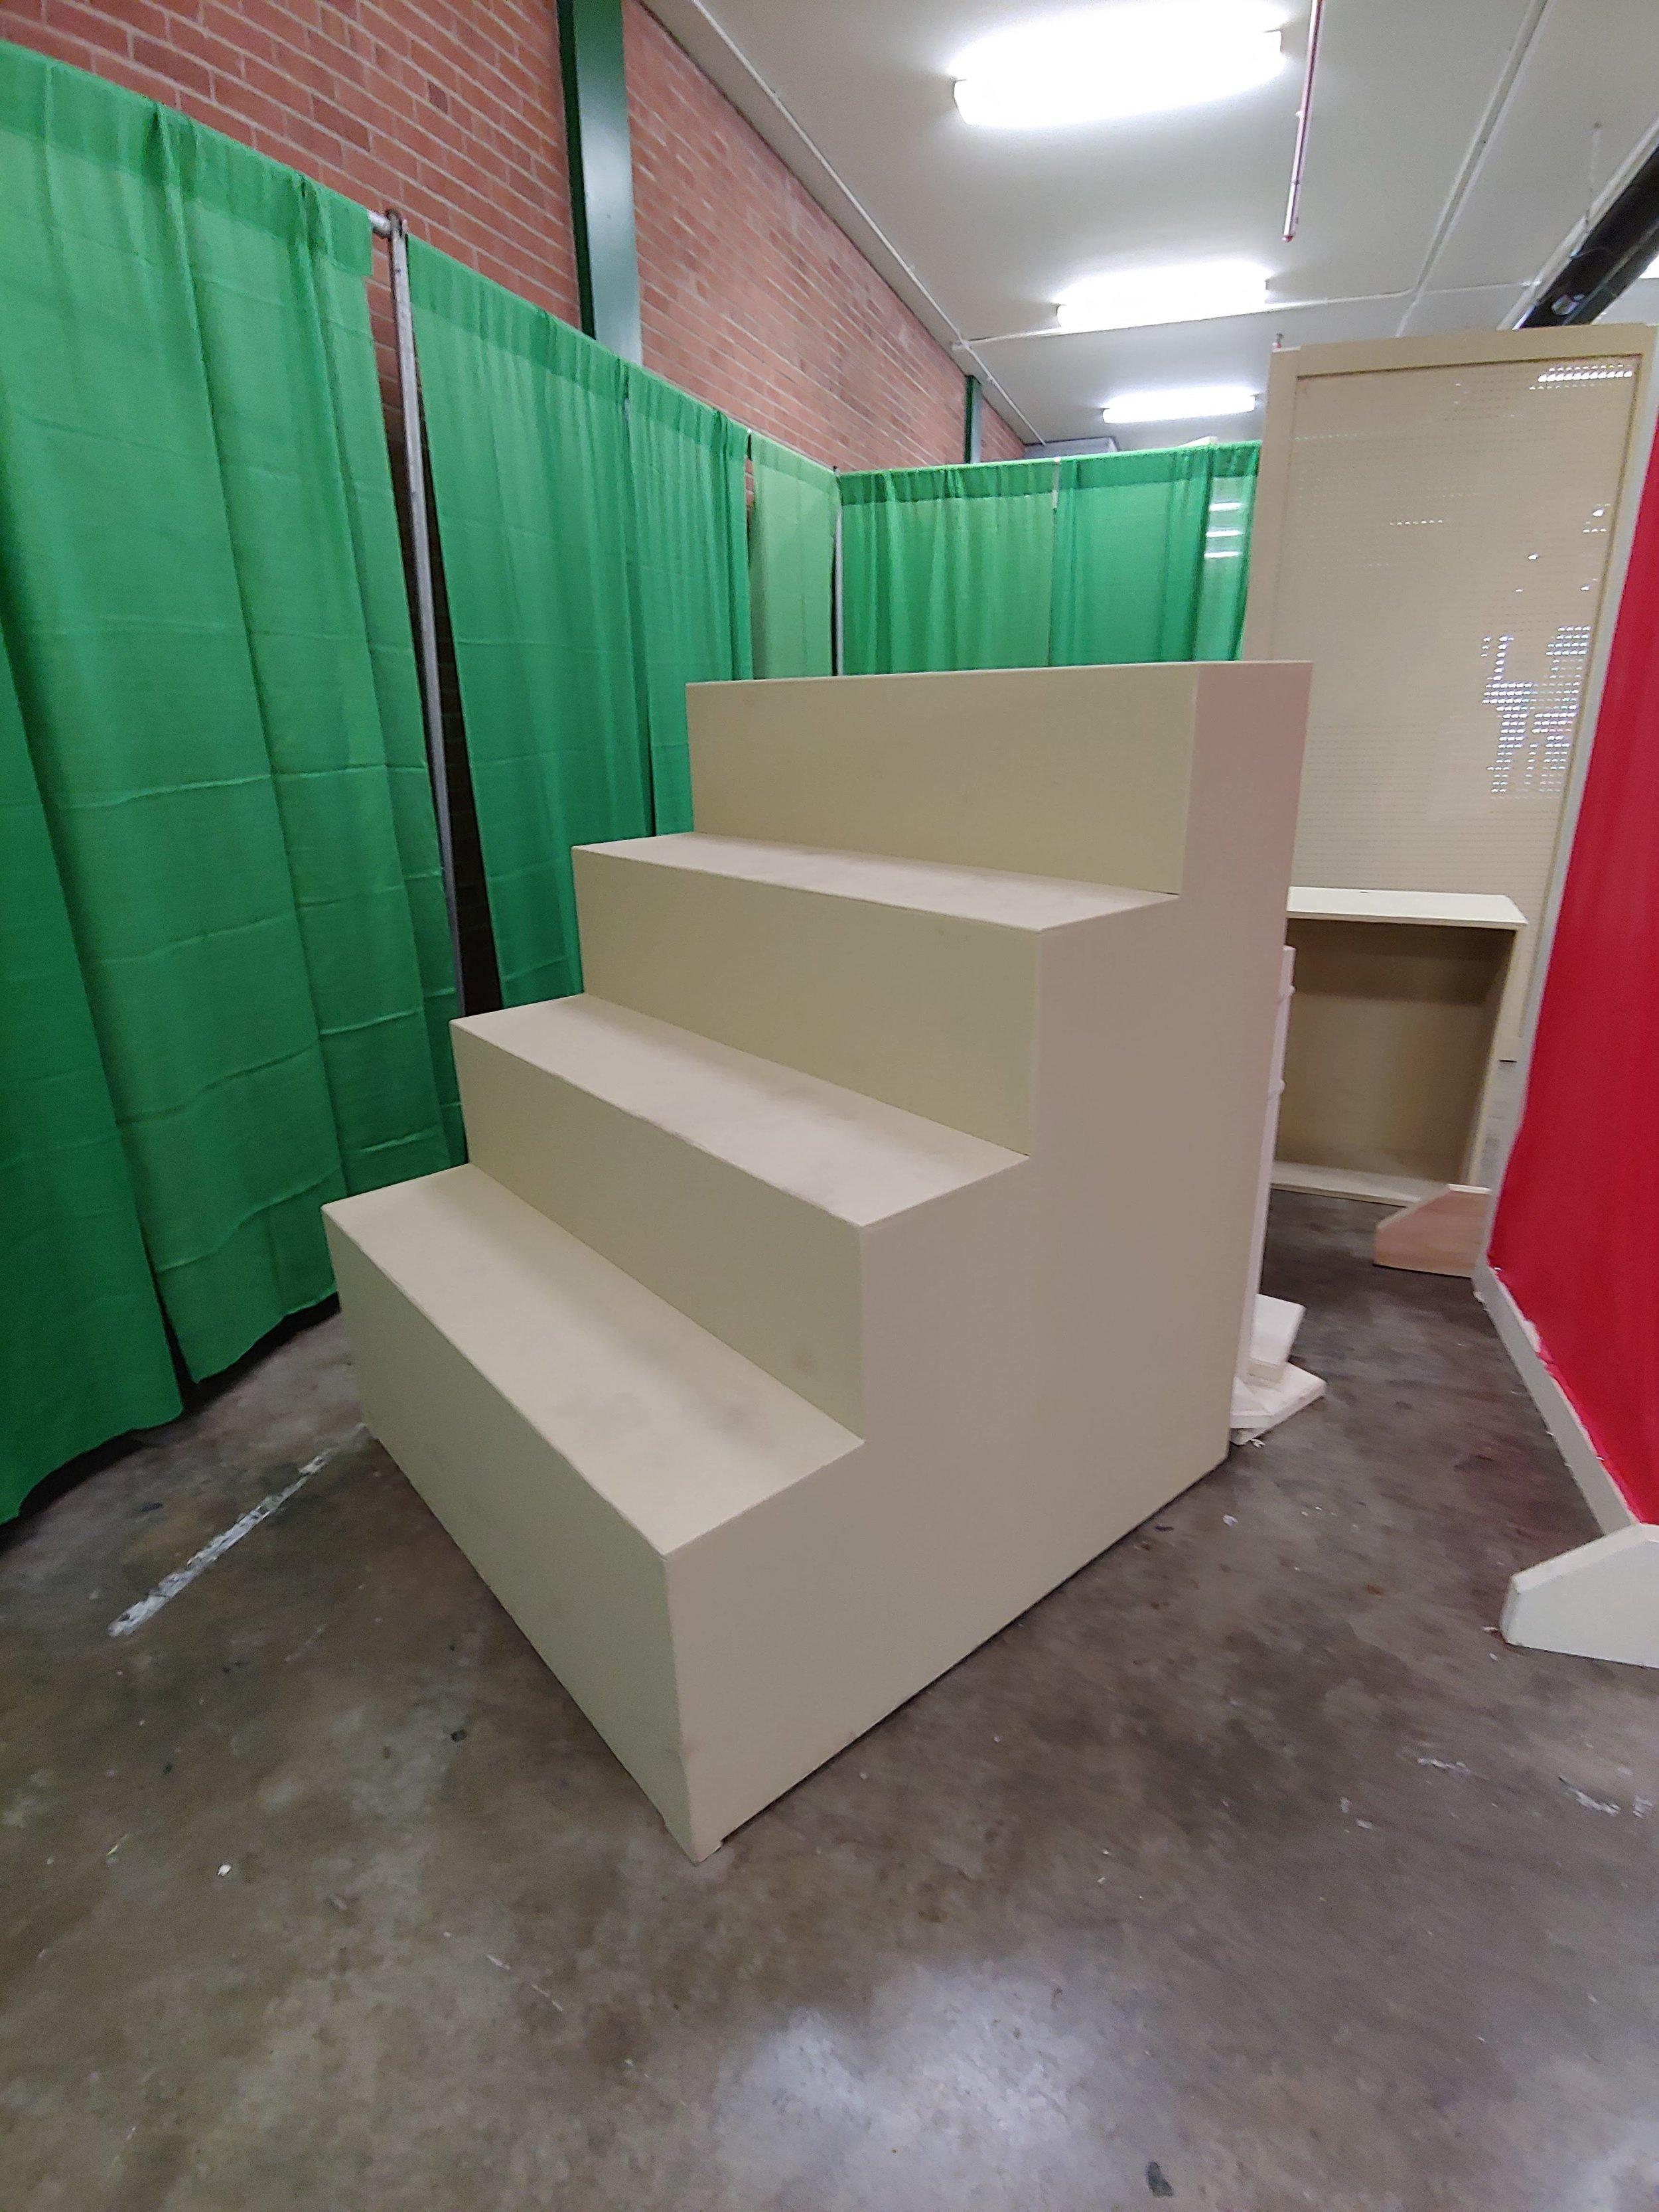 4X4 Step Display